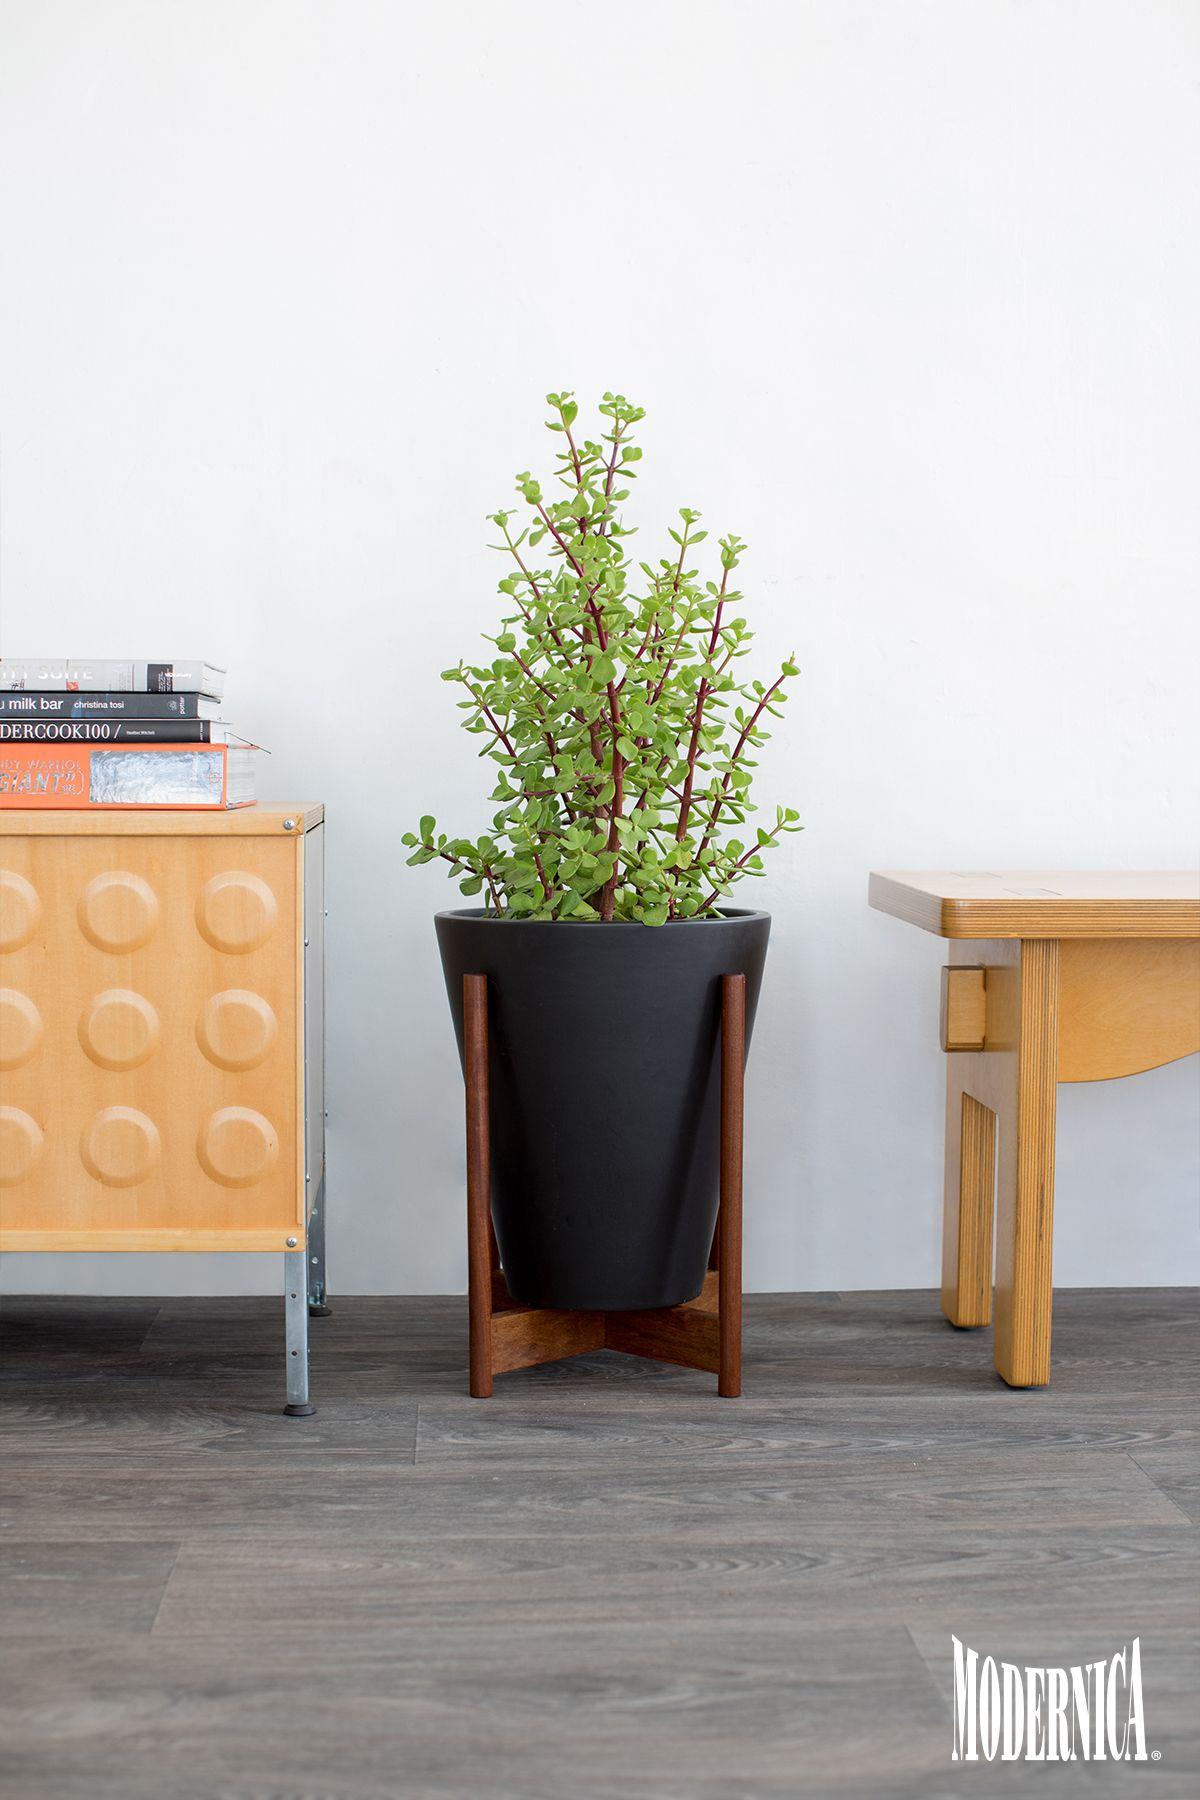 modernica case study® small funnel w stand modern ceramic  - modernica case study® small funnel w stand modern ceramic planters